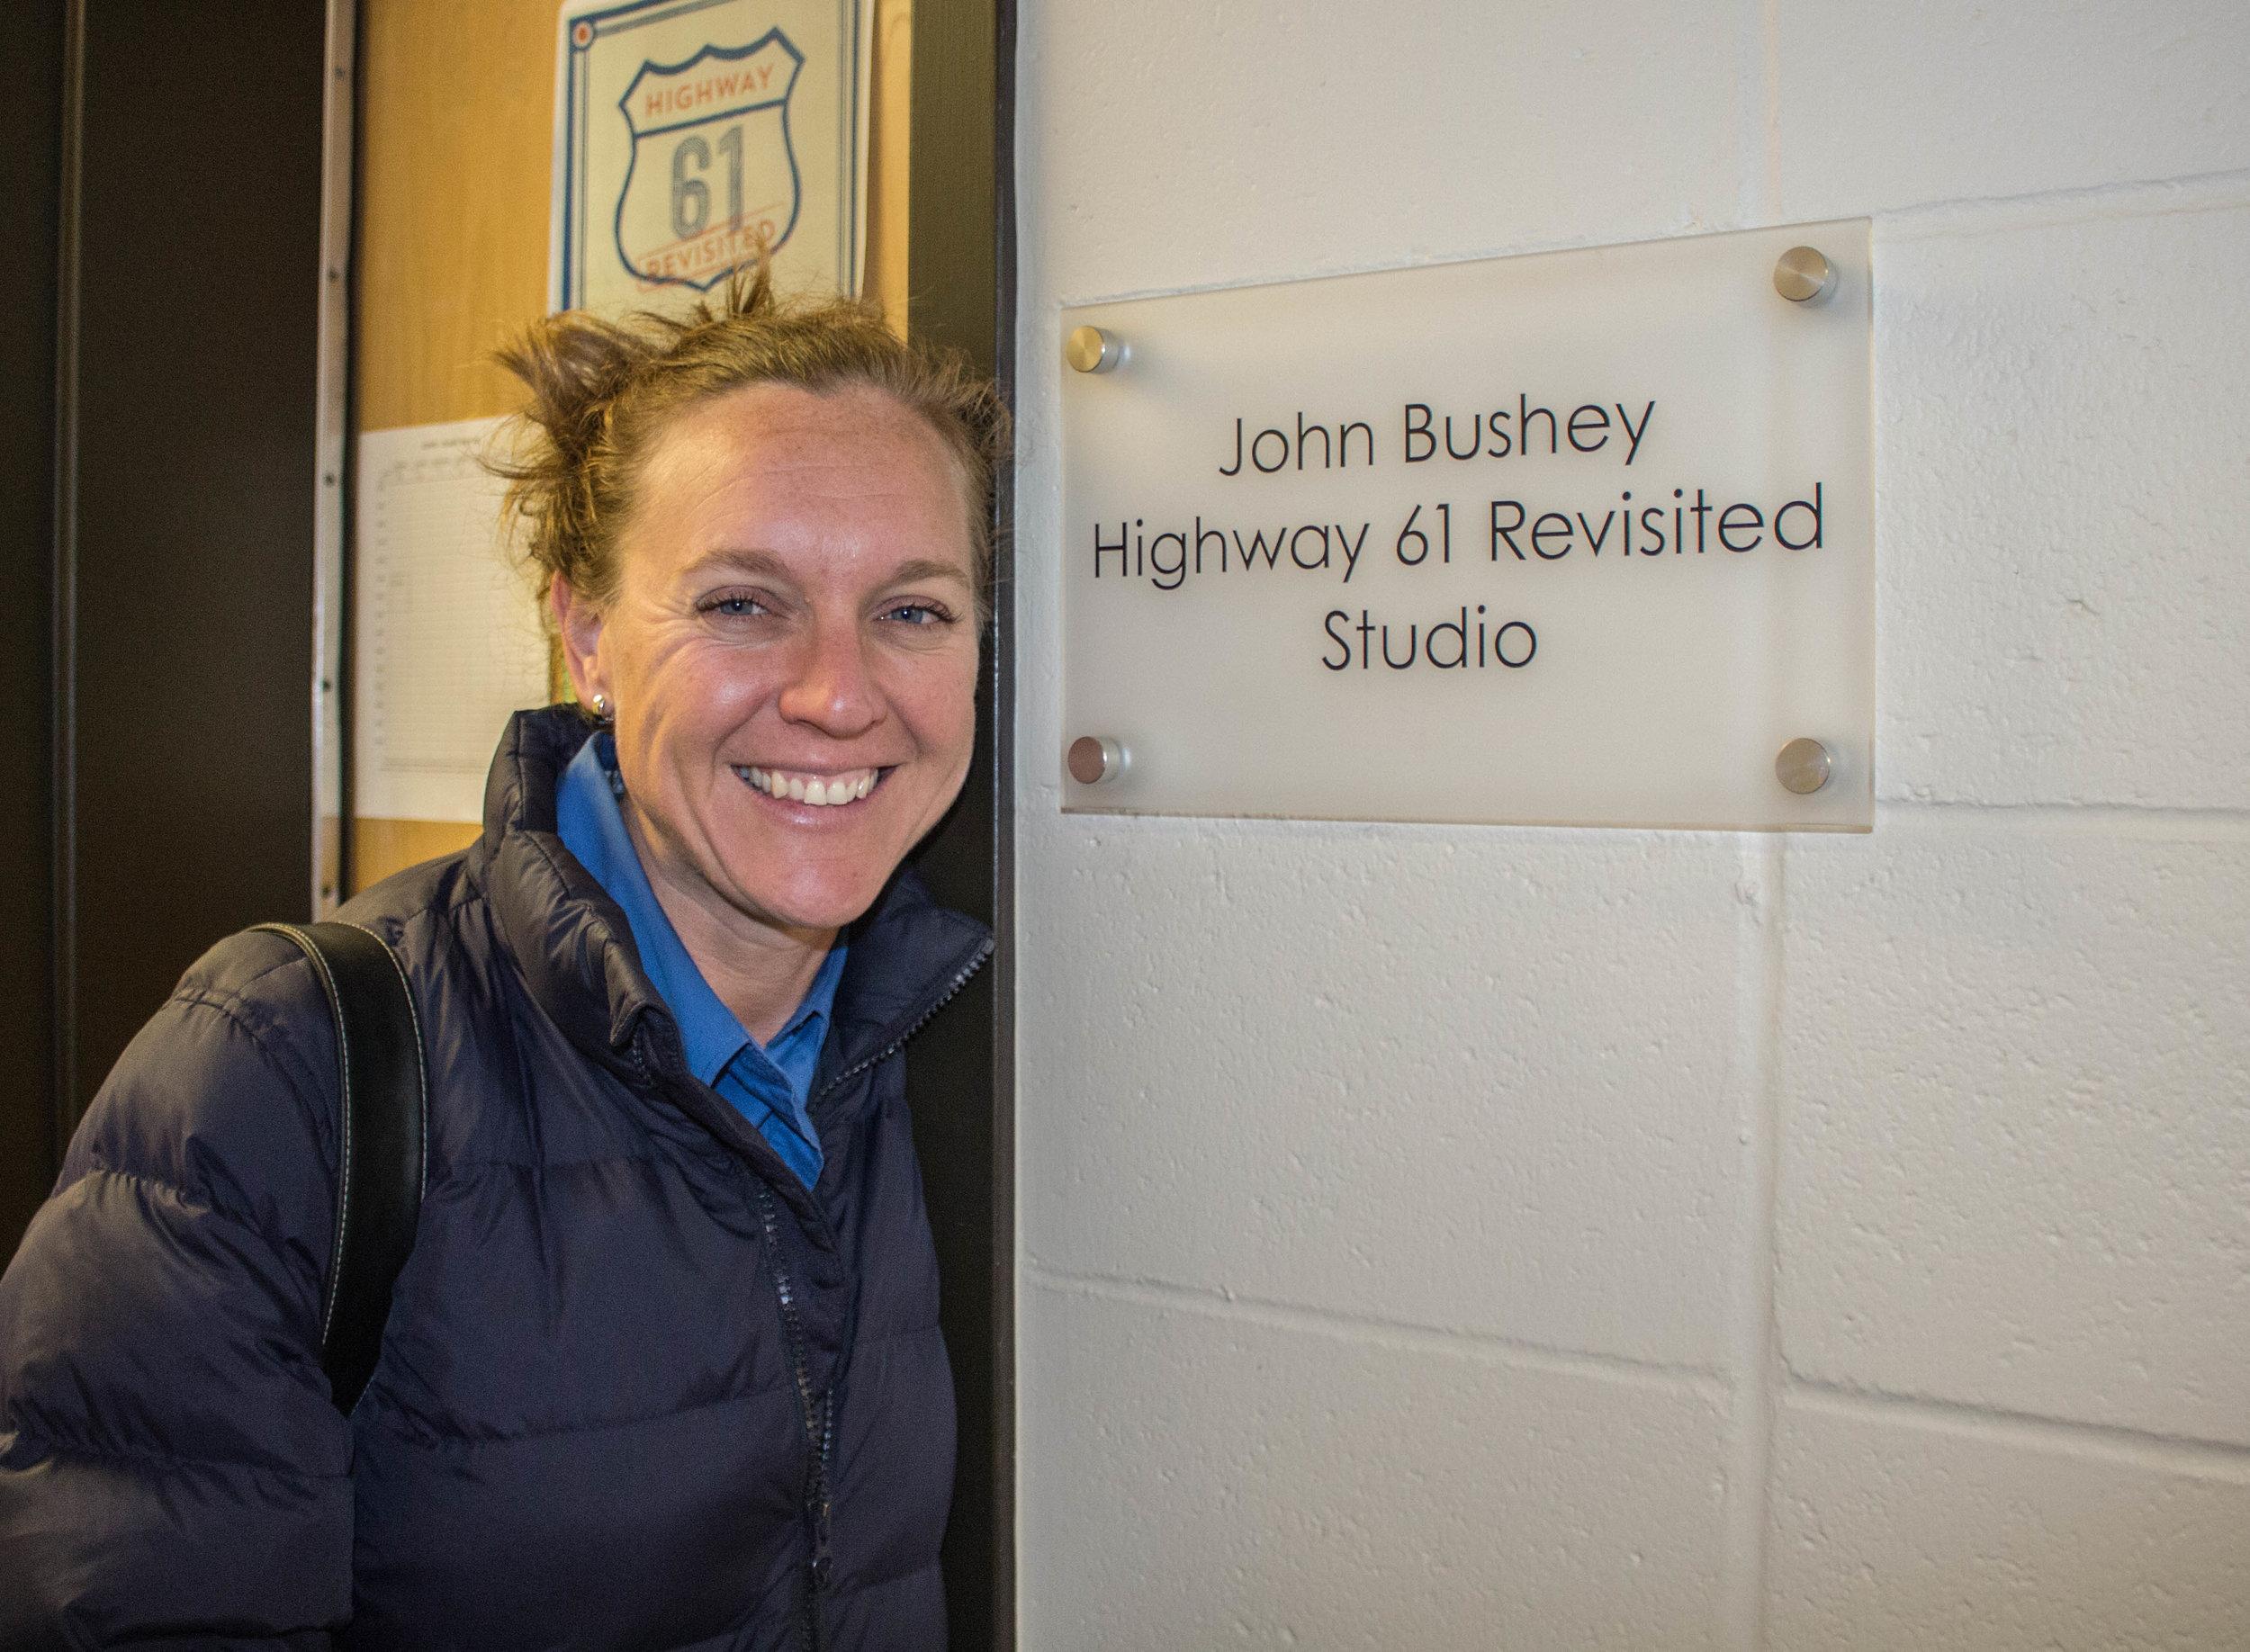 Miriam Hanson poses next to a plaque dedicated to John Bushey in the KUMD studio. Photo by Justin Flesher